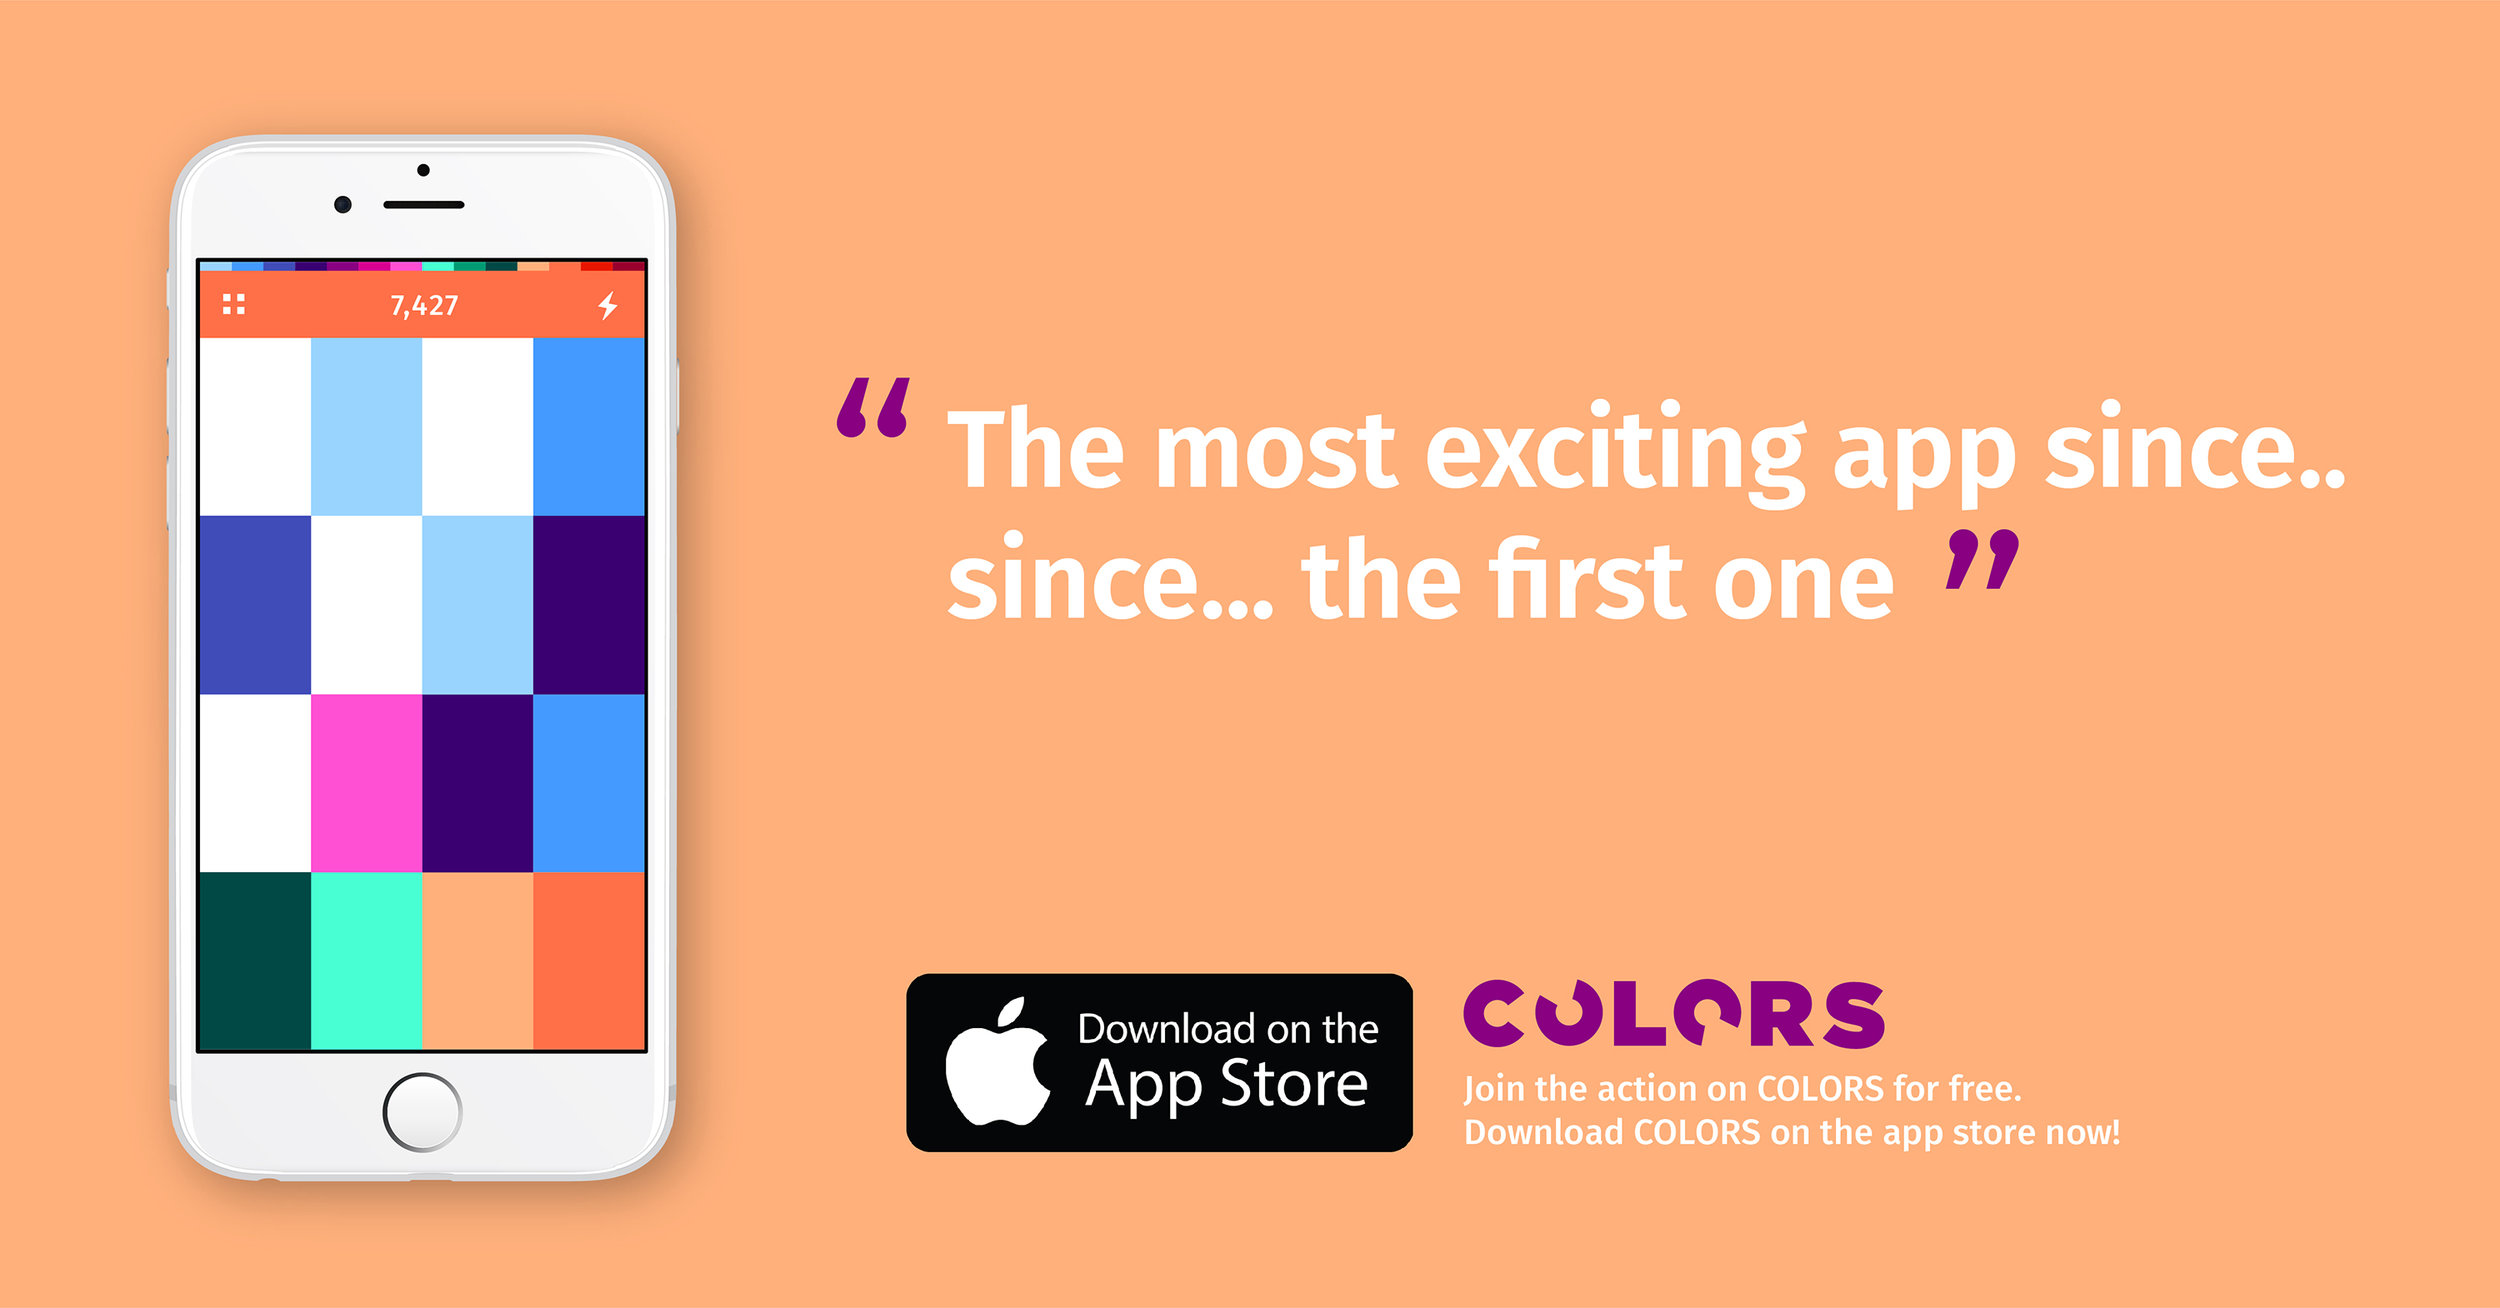 COLORS-facebook-ads-02.jpg